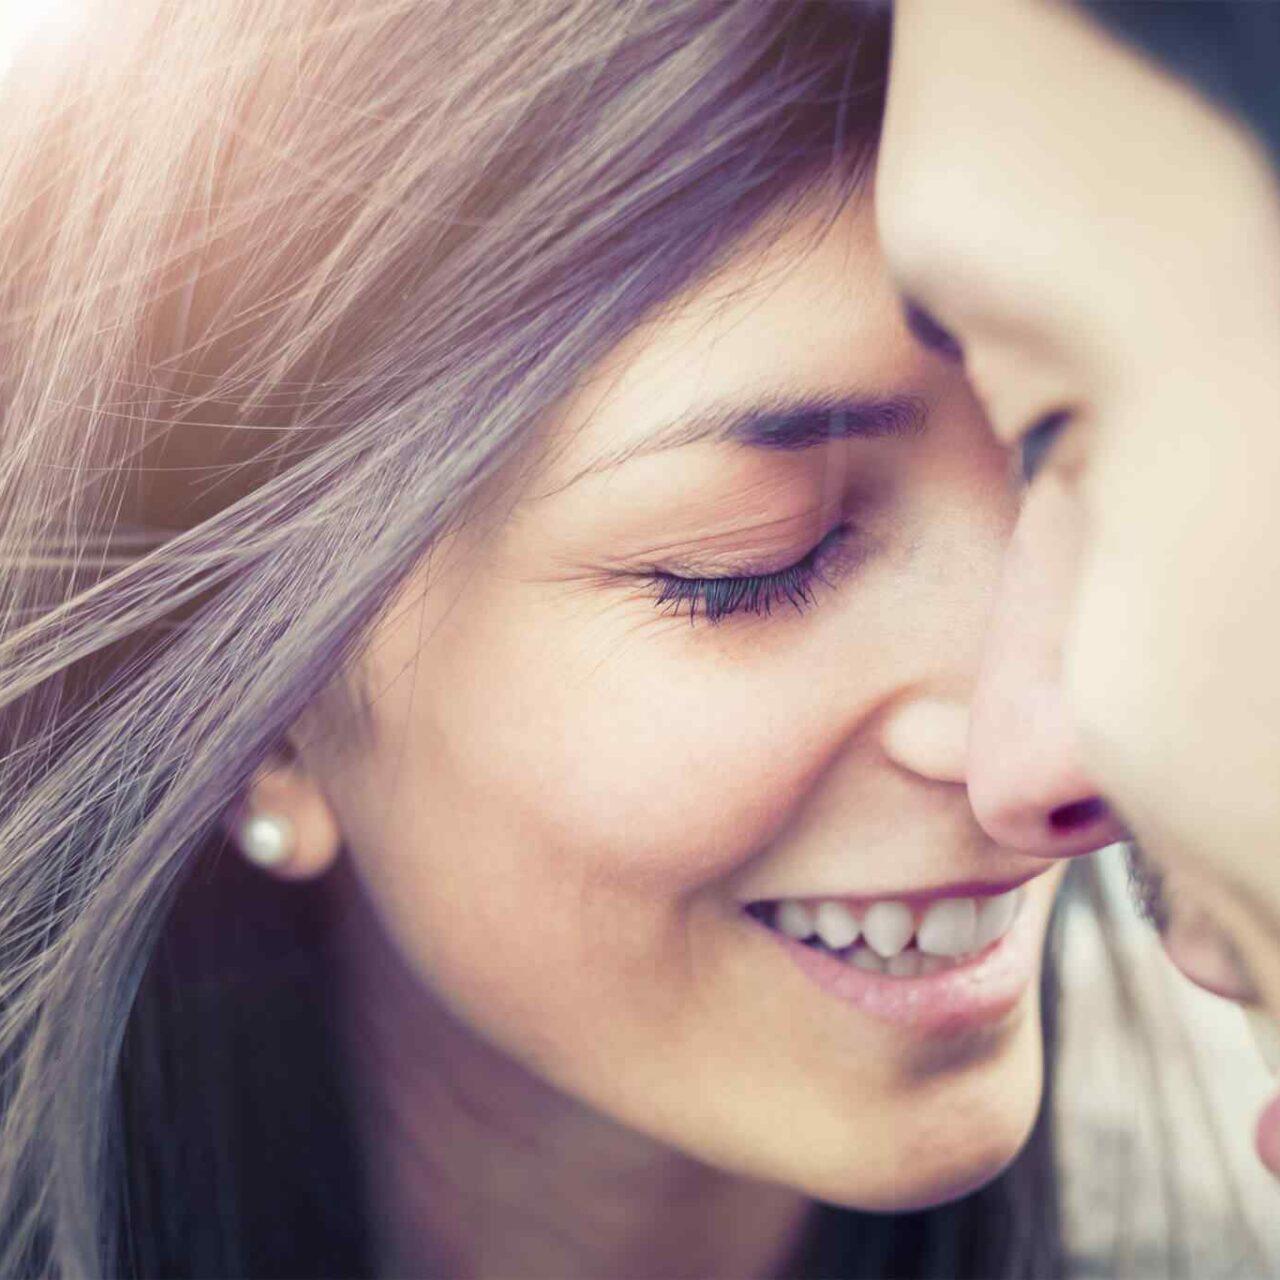 https://ademvrouw.nl/wp-content/uploads/2018/01/img-class-marriage-01-1280x1280.jpg